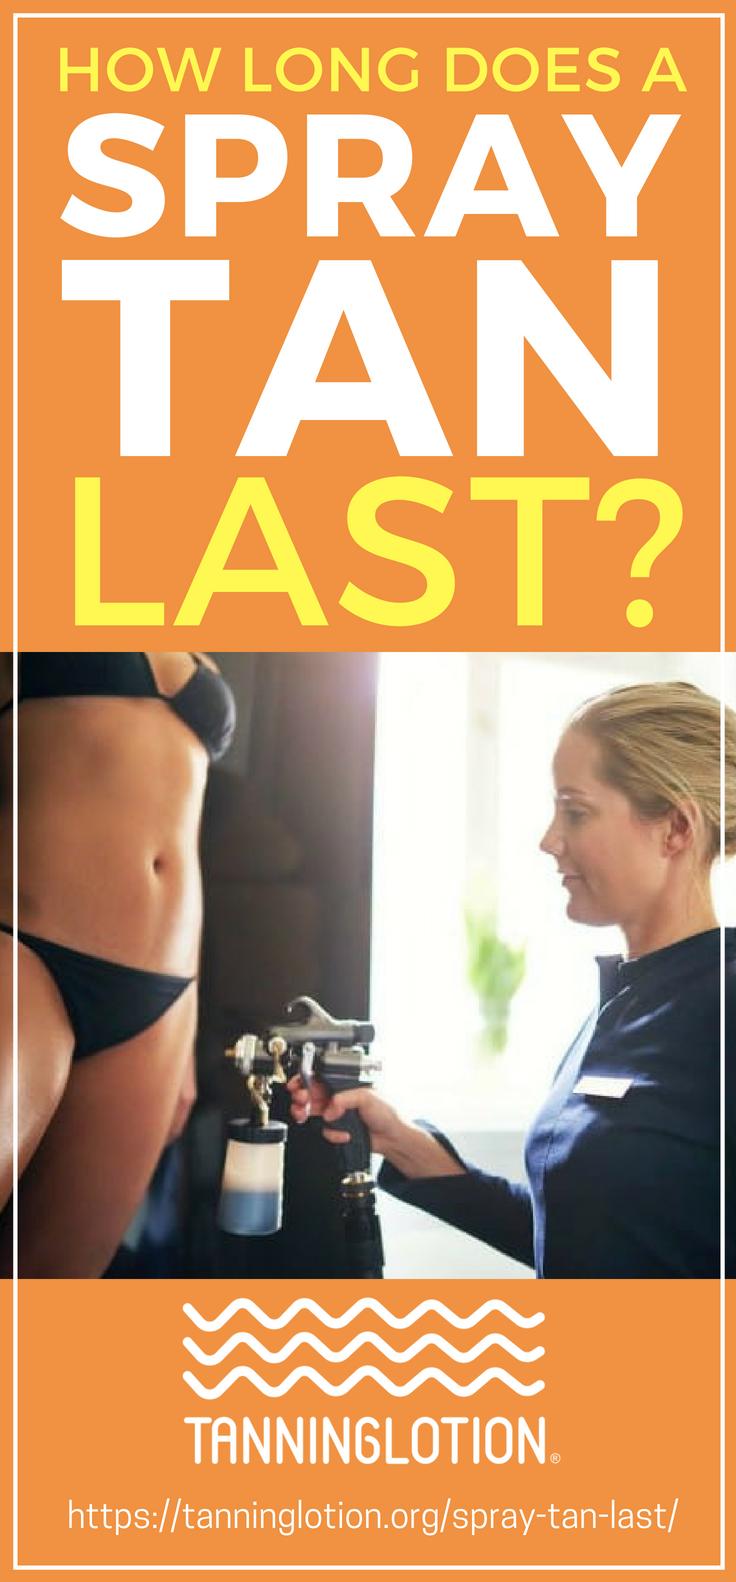 How long does a tan last